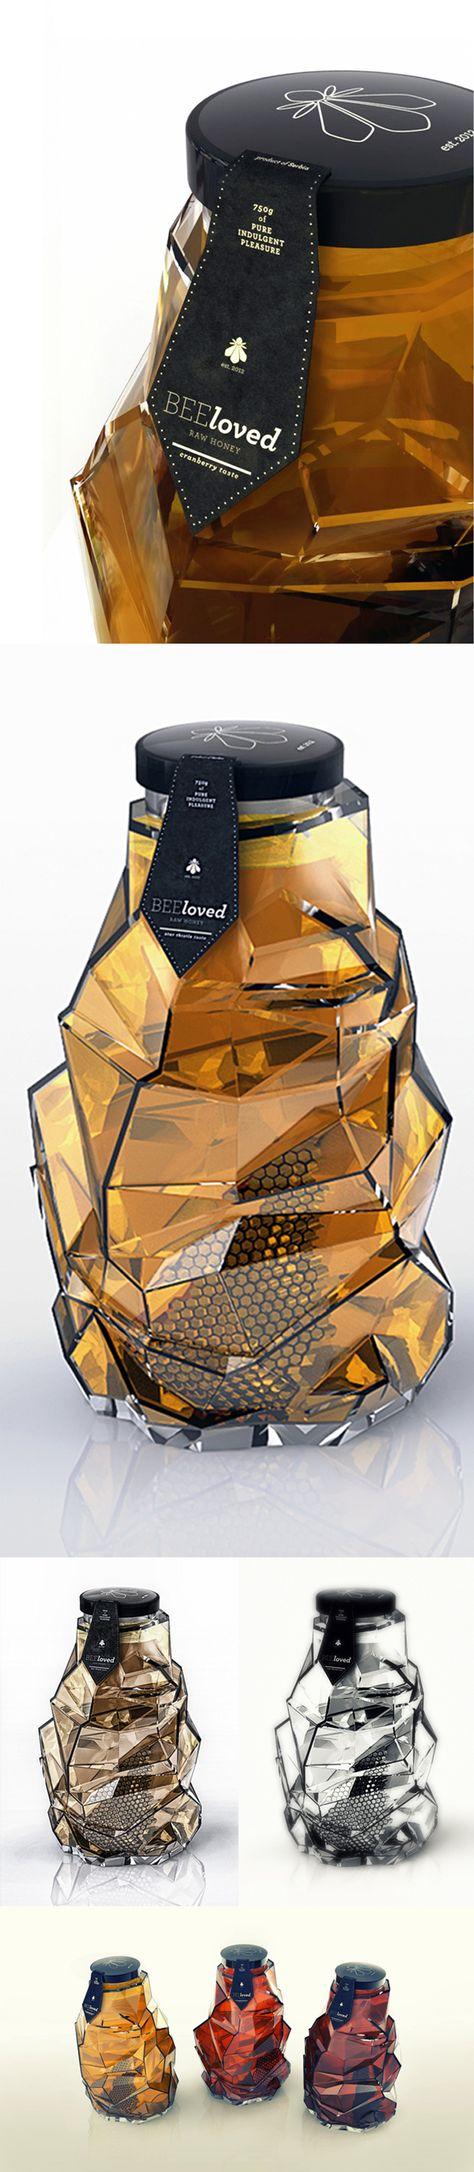 Honey packaging designed by Tamara Mihajlovic